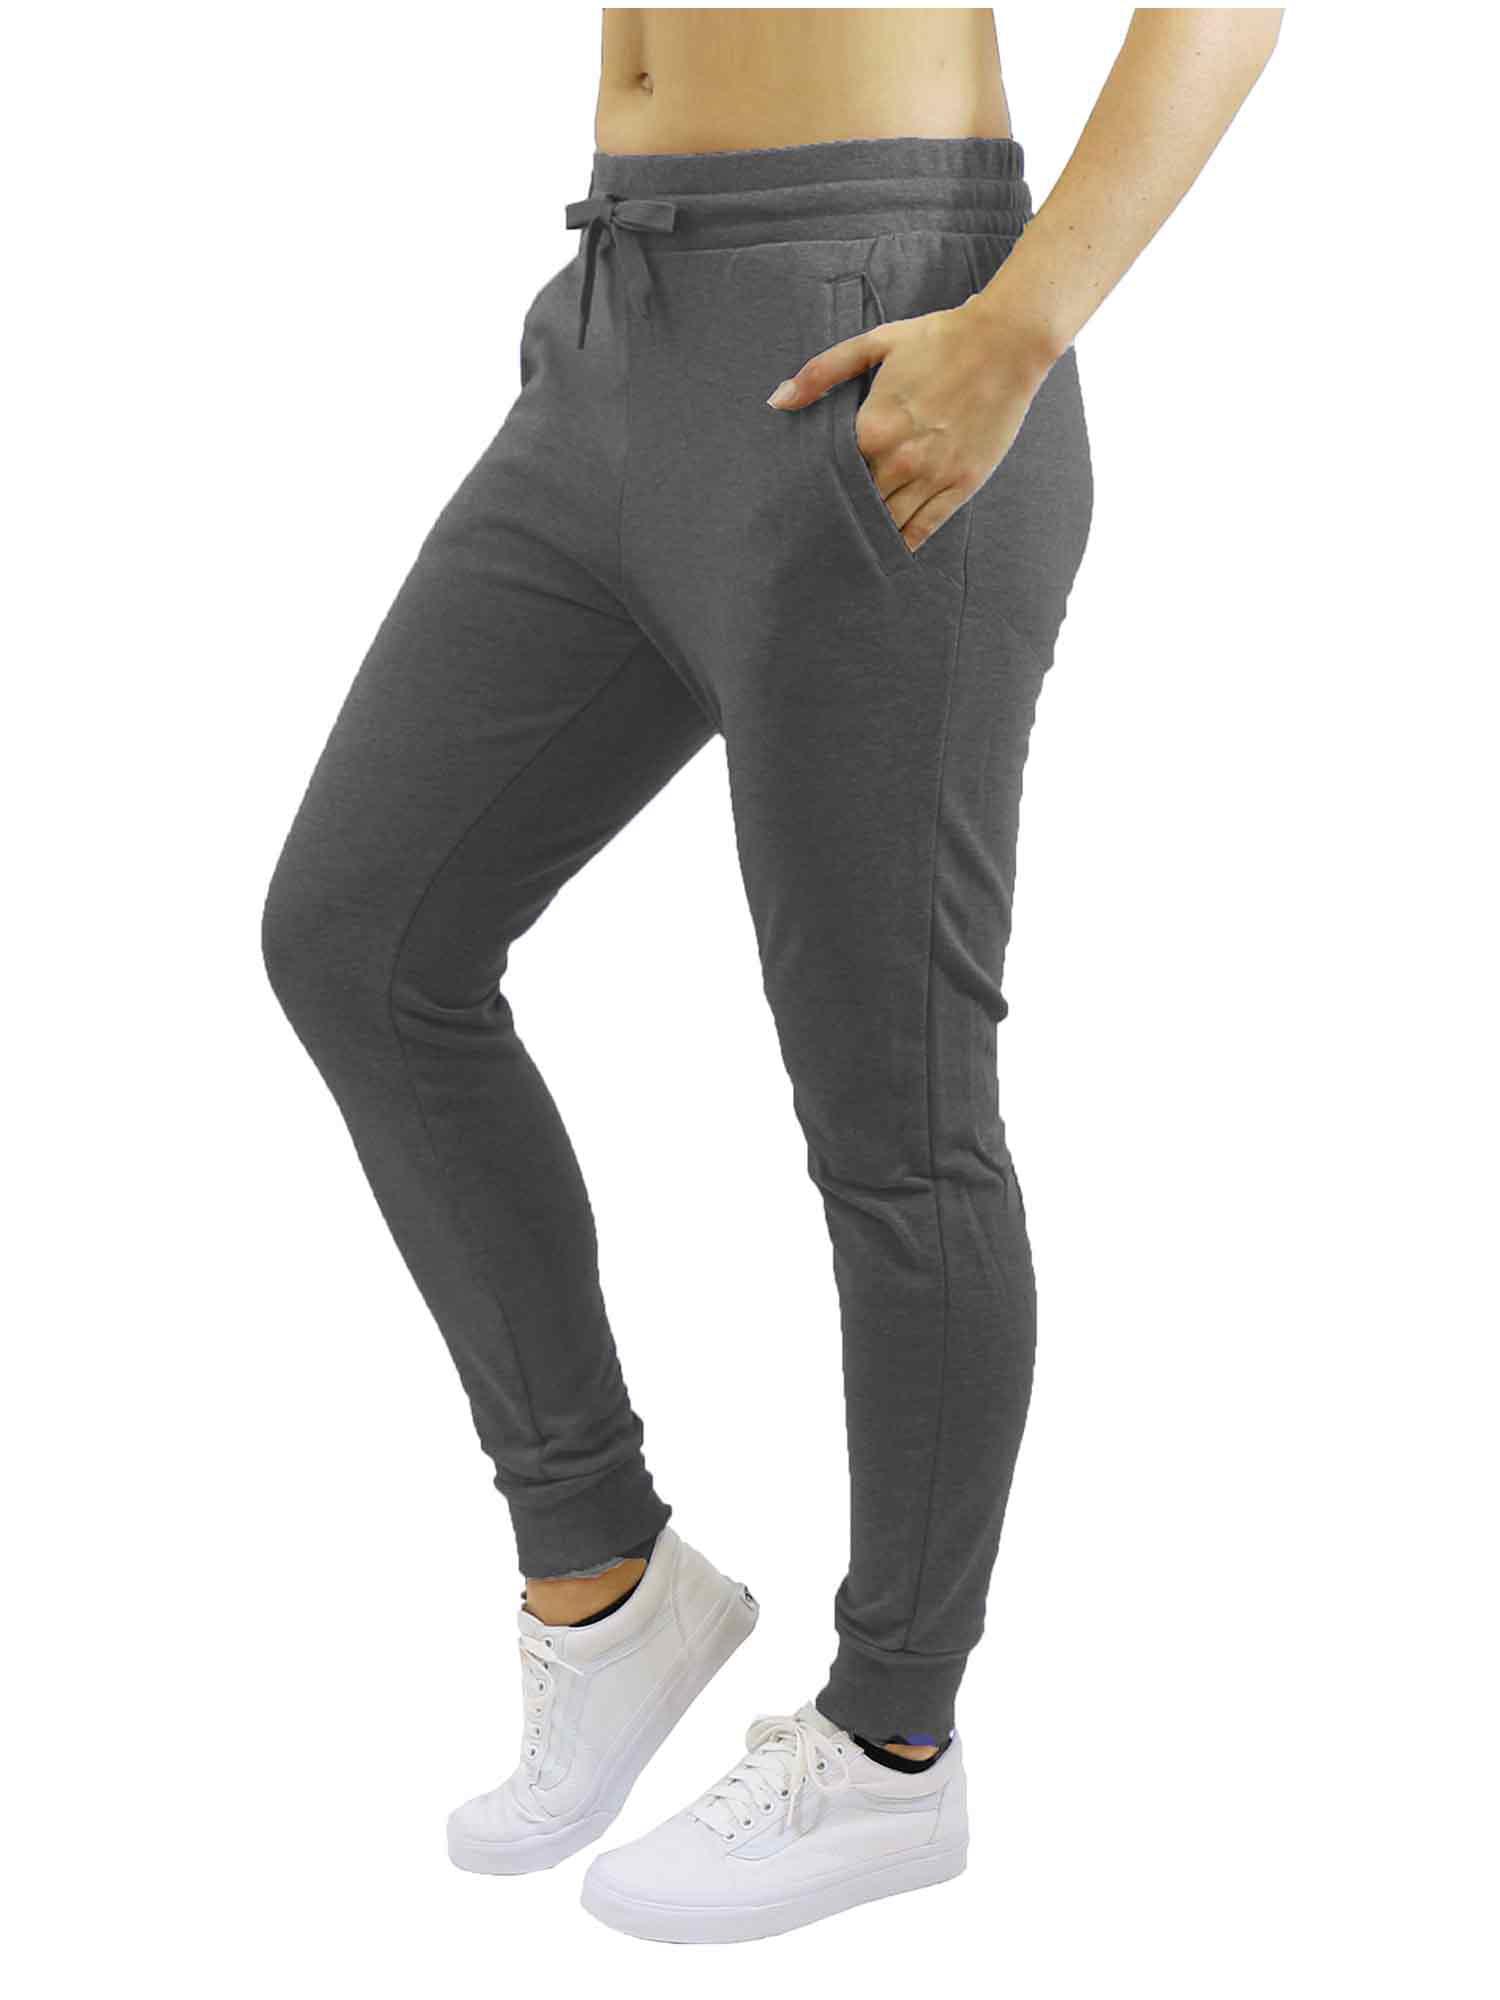 Womens Fleece Jogger Sweatpants With Zipper Pockets - SLIM FIT